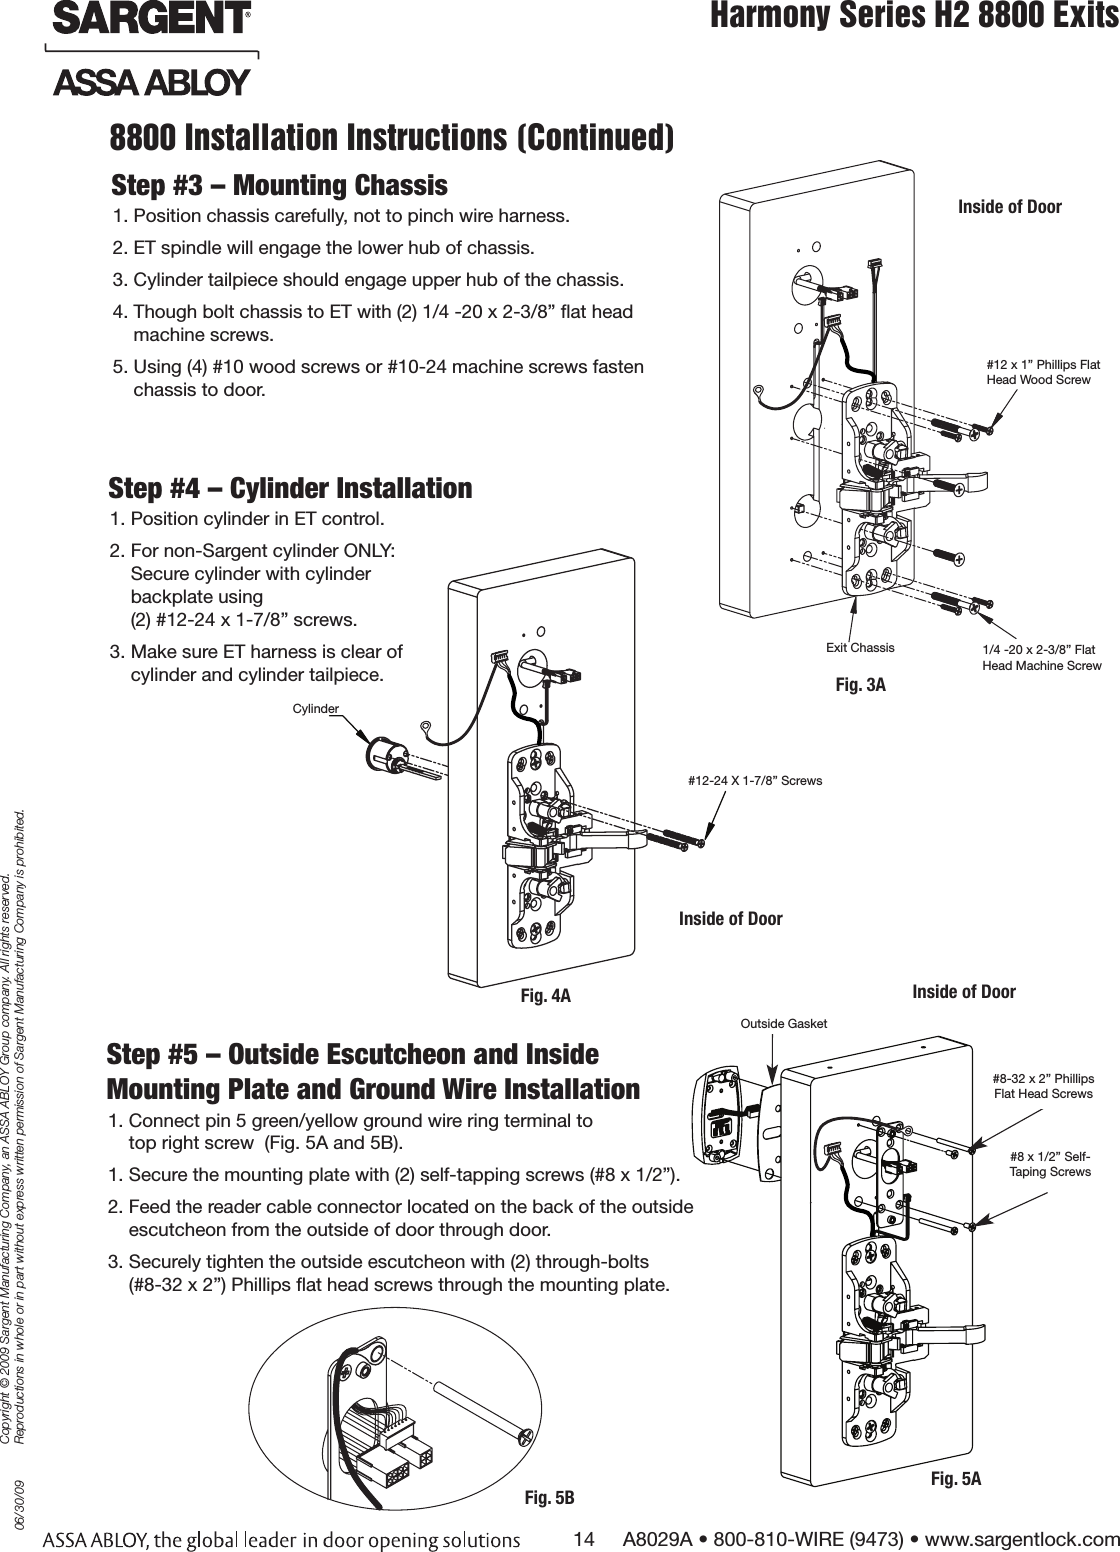 Assaloy Scyprox2 Harmony H2 Series Lock User Manual Fcc